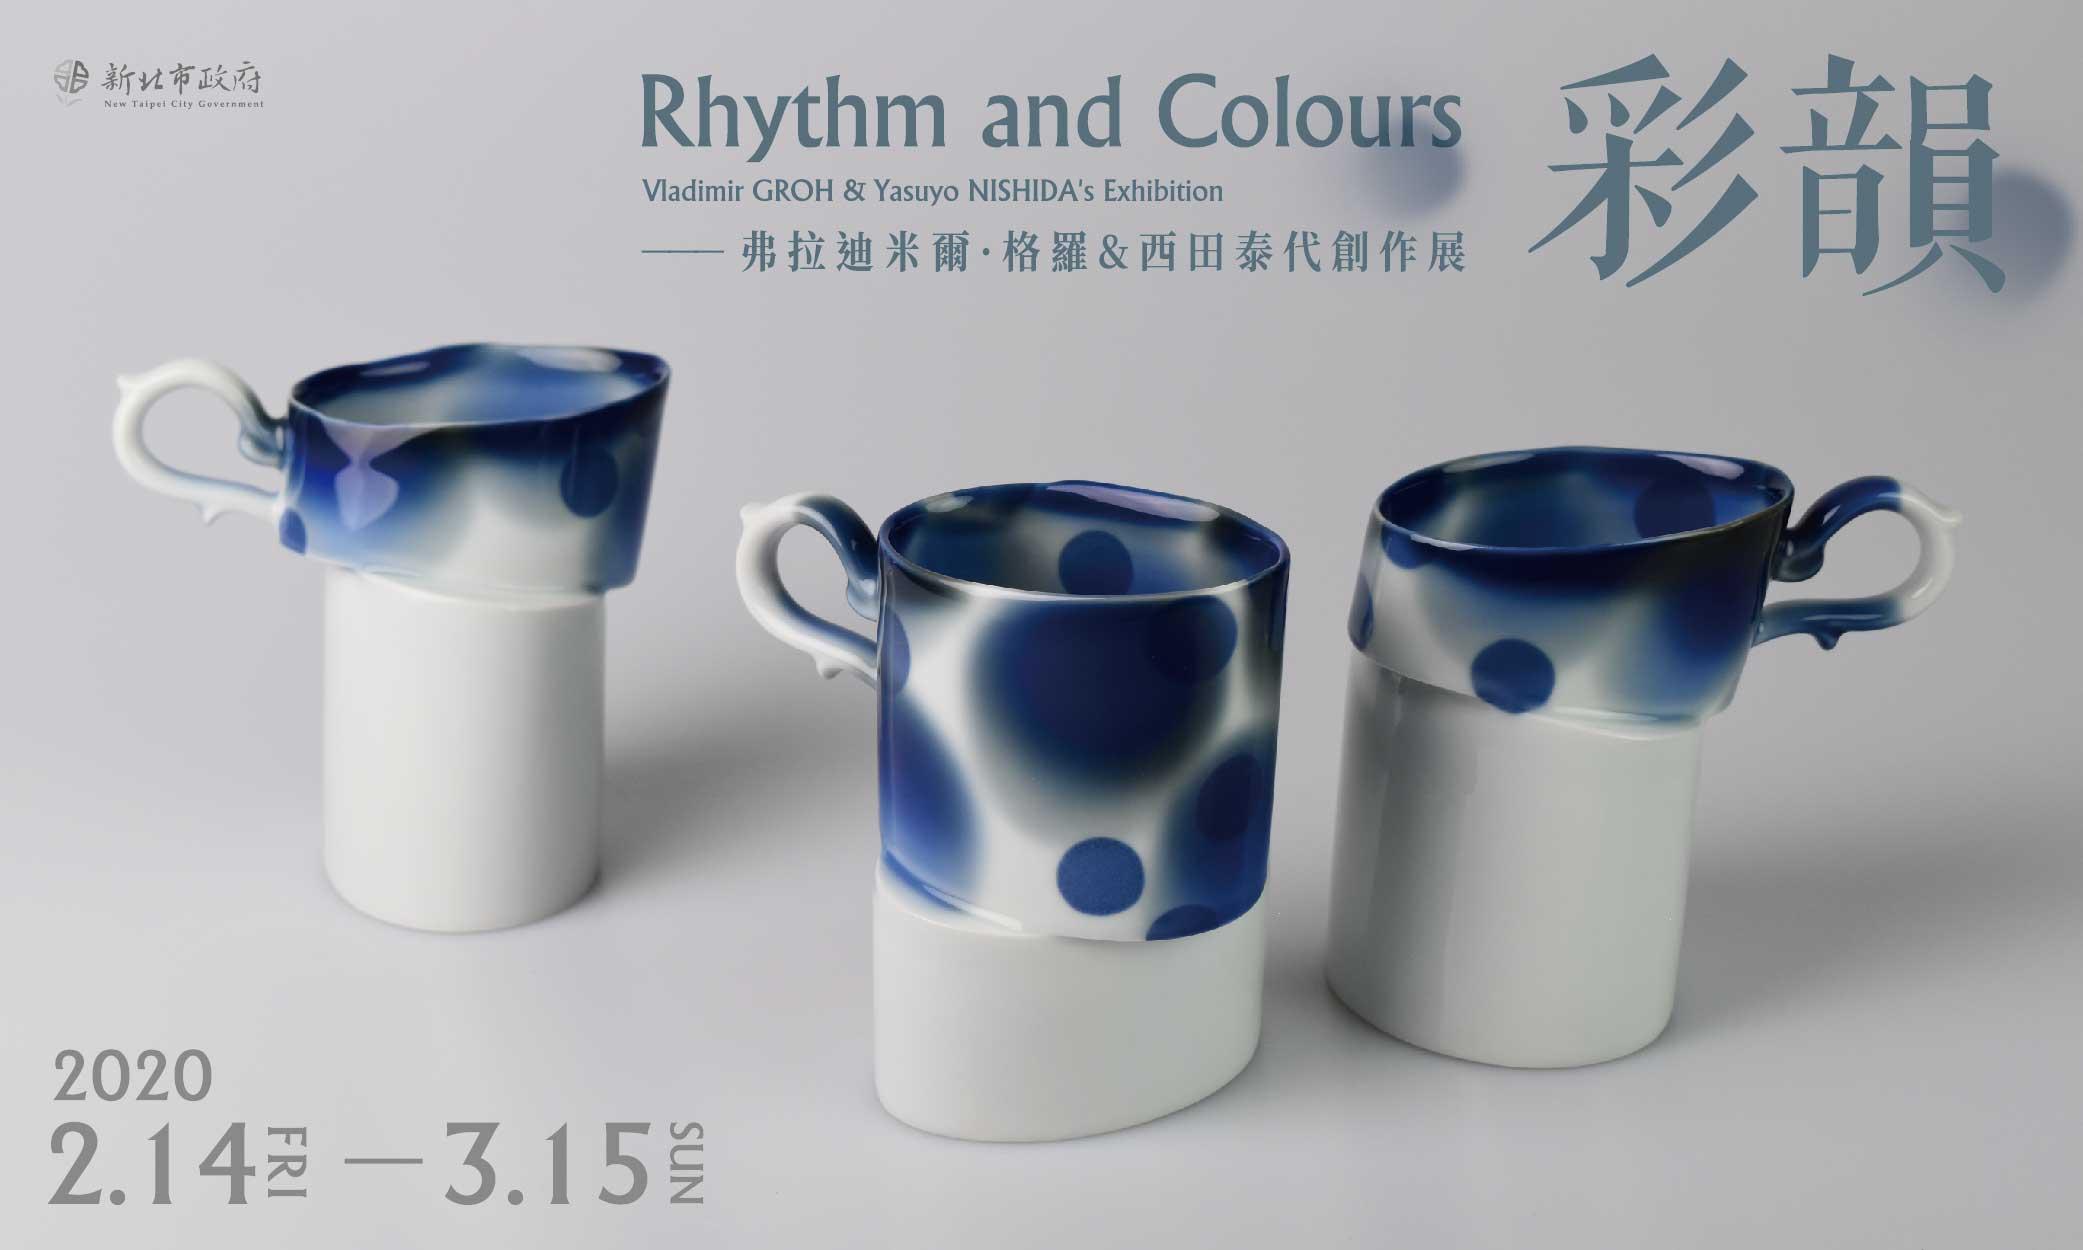 Rhythm and Colours-Vladimir GROH & Yasuyo NISHIDA's Exhibition